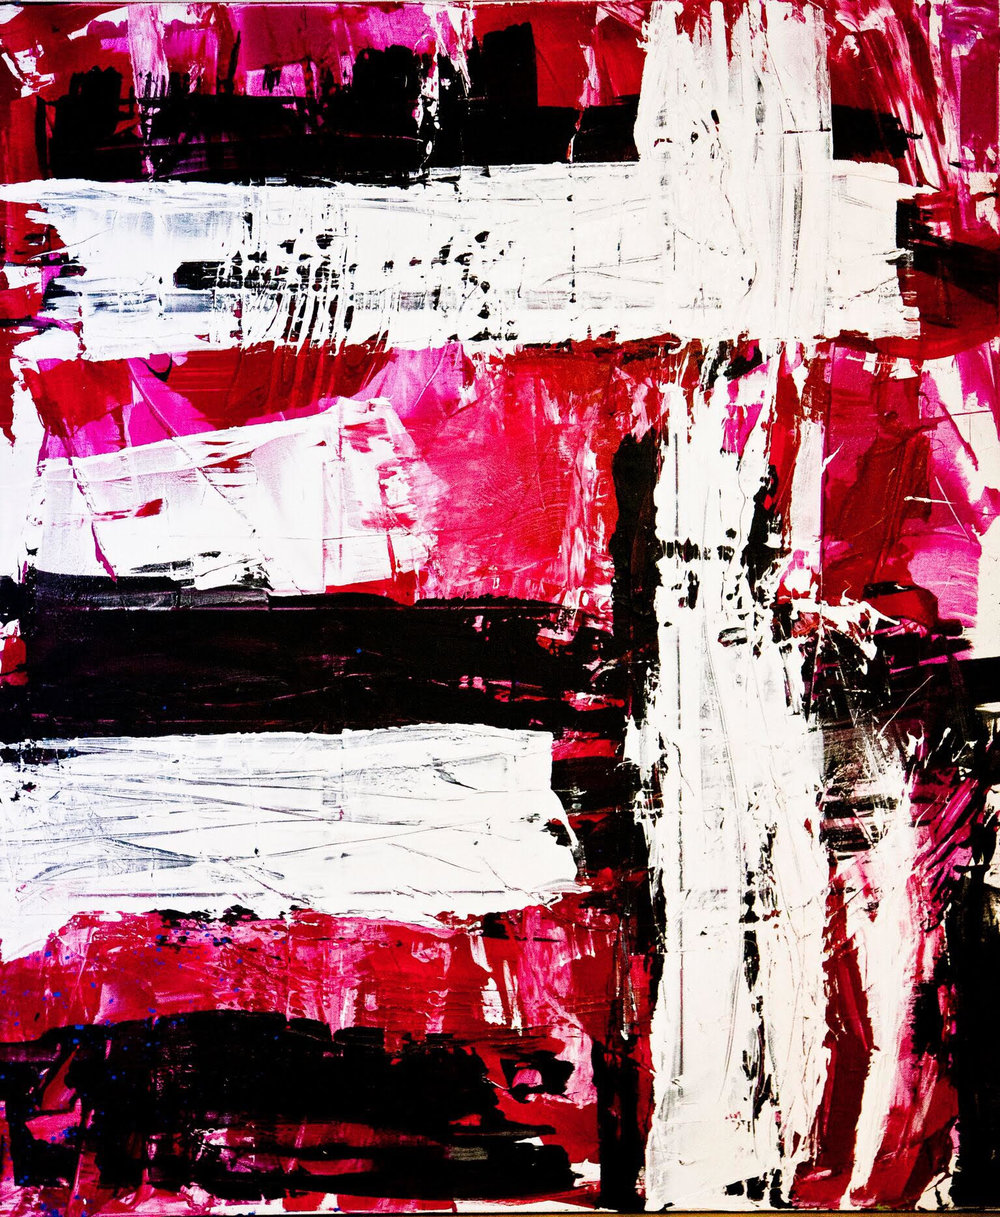 red pink white black.jpg